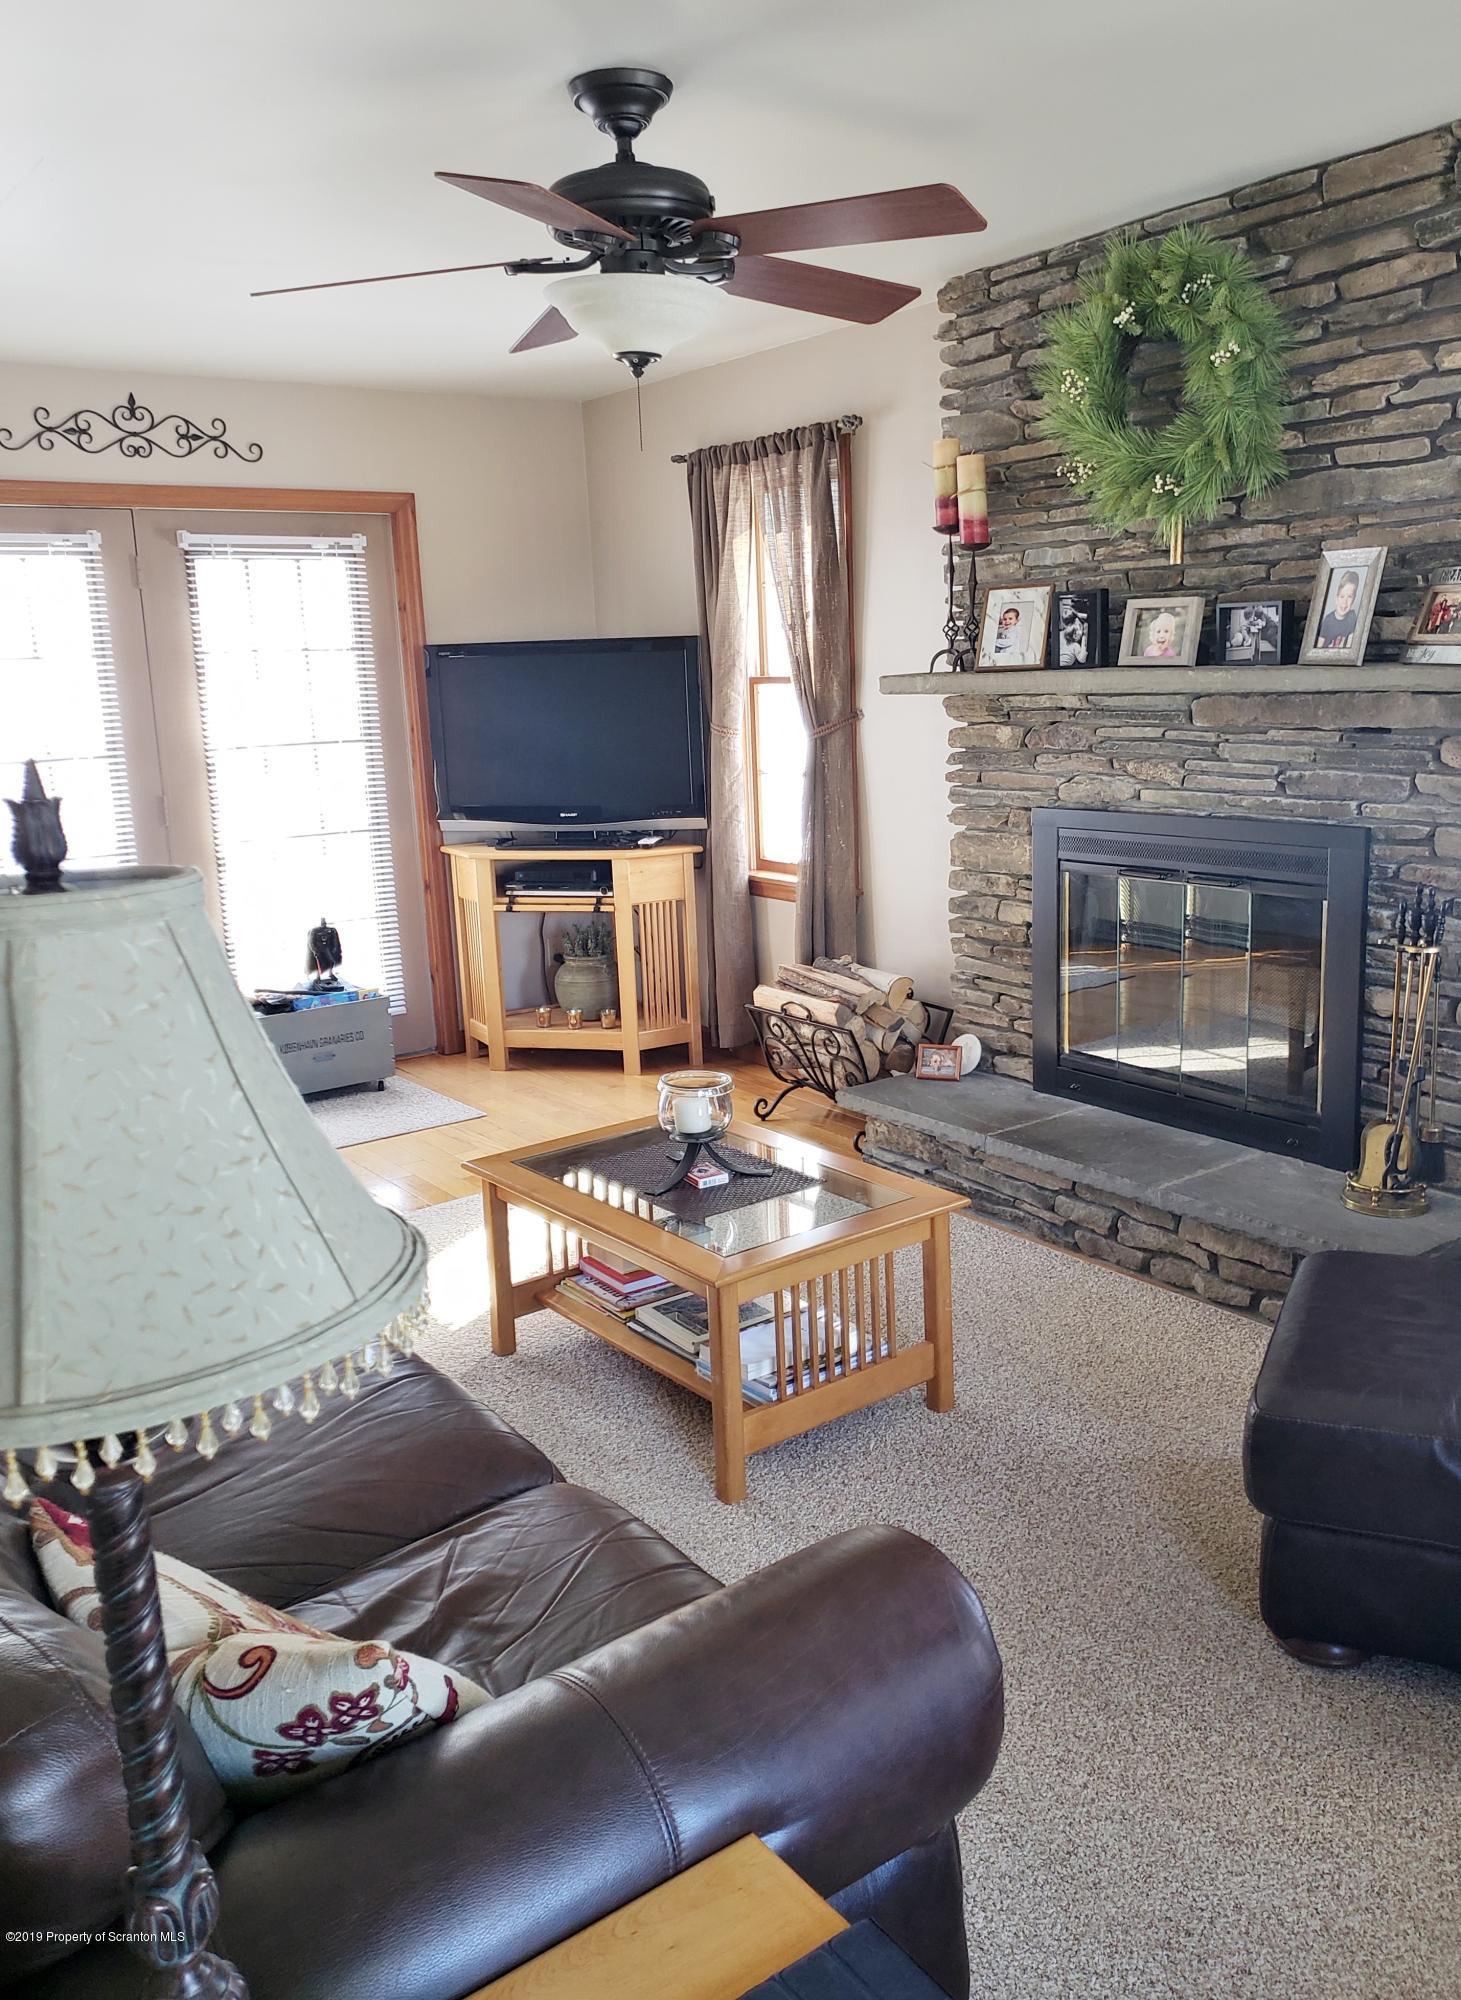 1306 Seamans Road, Factoryville, Pennsylvania 18419, 3 Bedrooms Bedrooms, 8 Rooms Rooms,3 BathroomsBathrooms,Single Family,For Sale,Seamans Road,19-480